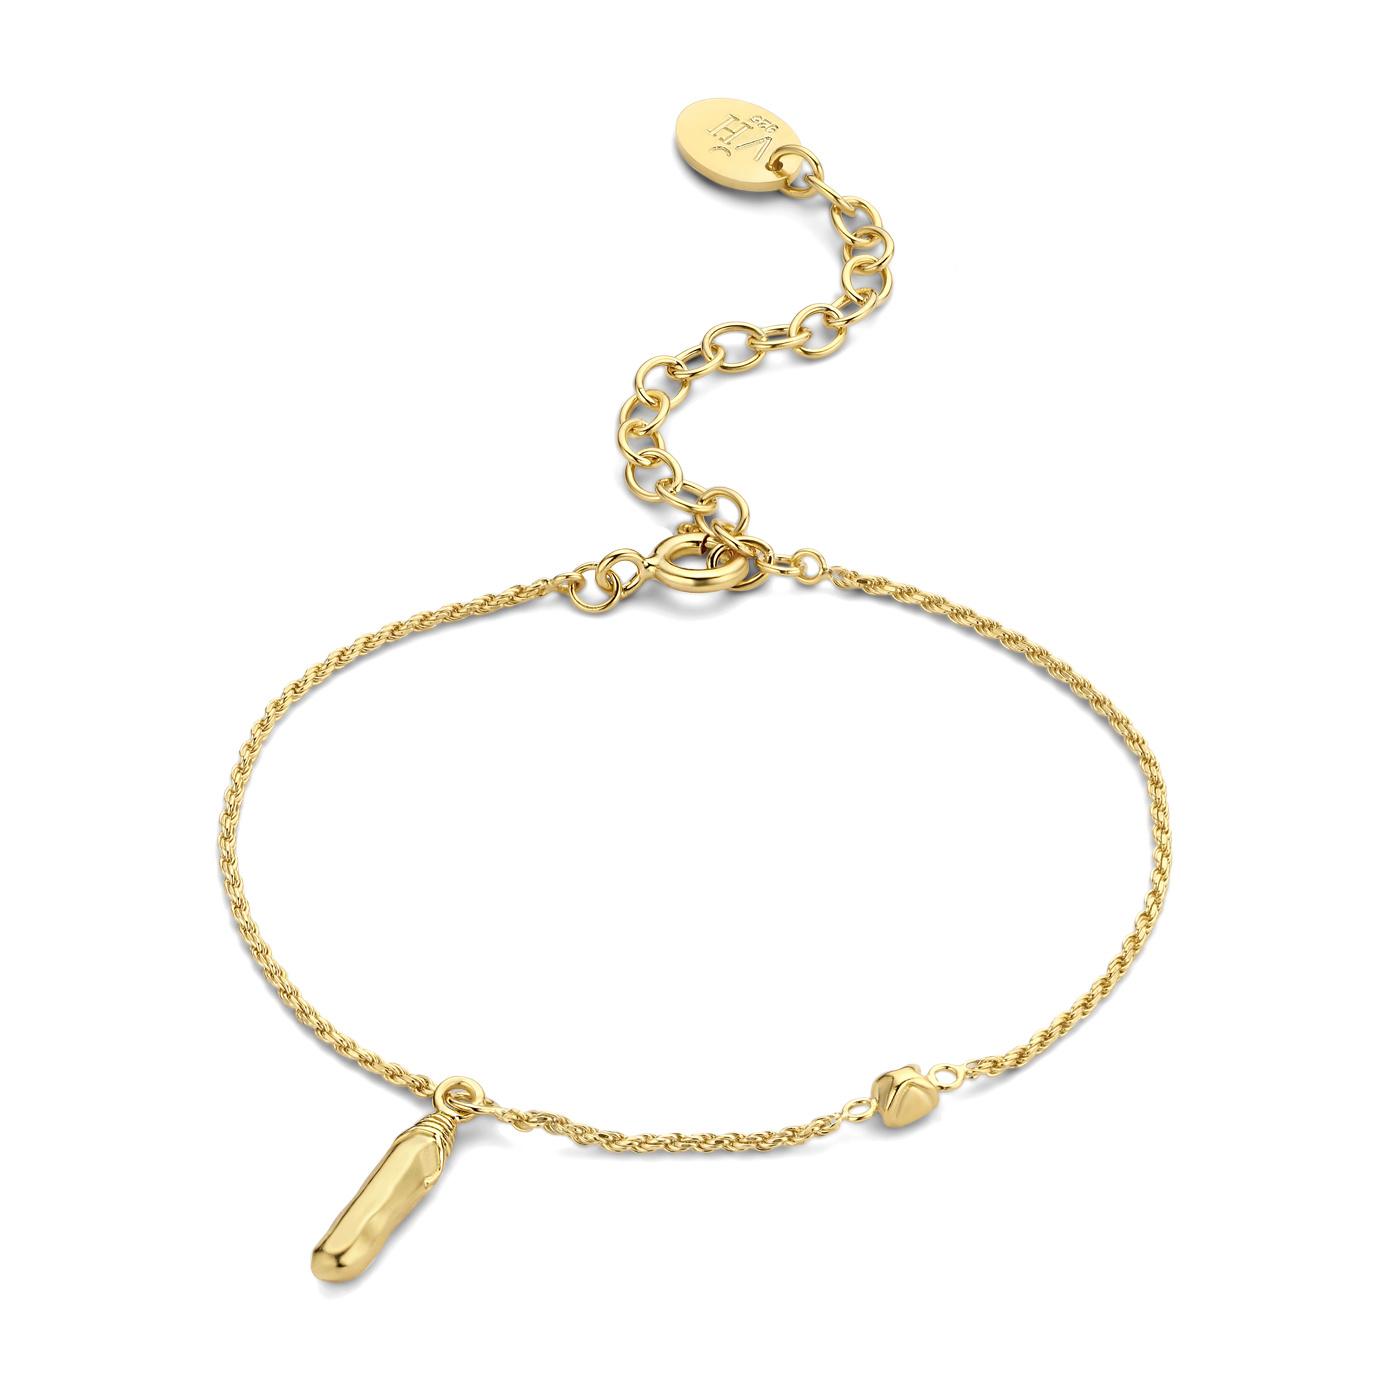 Violet Hamden Sisterhood Mona bracciale color oro in argento sterling 925